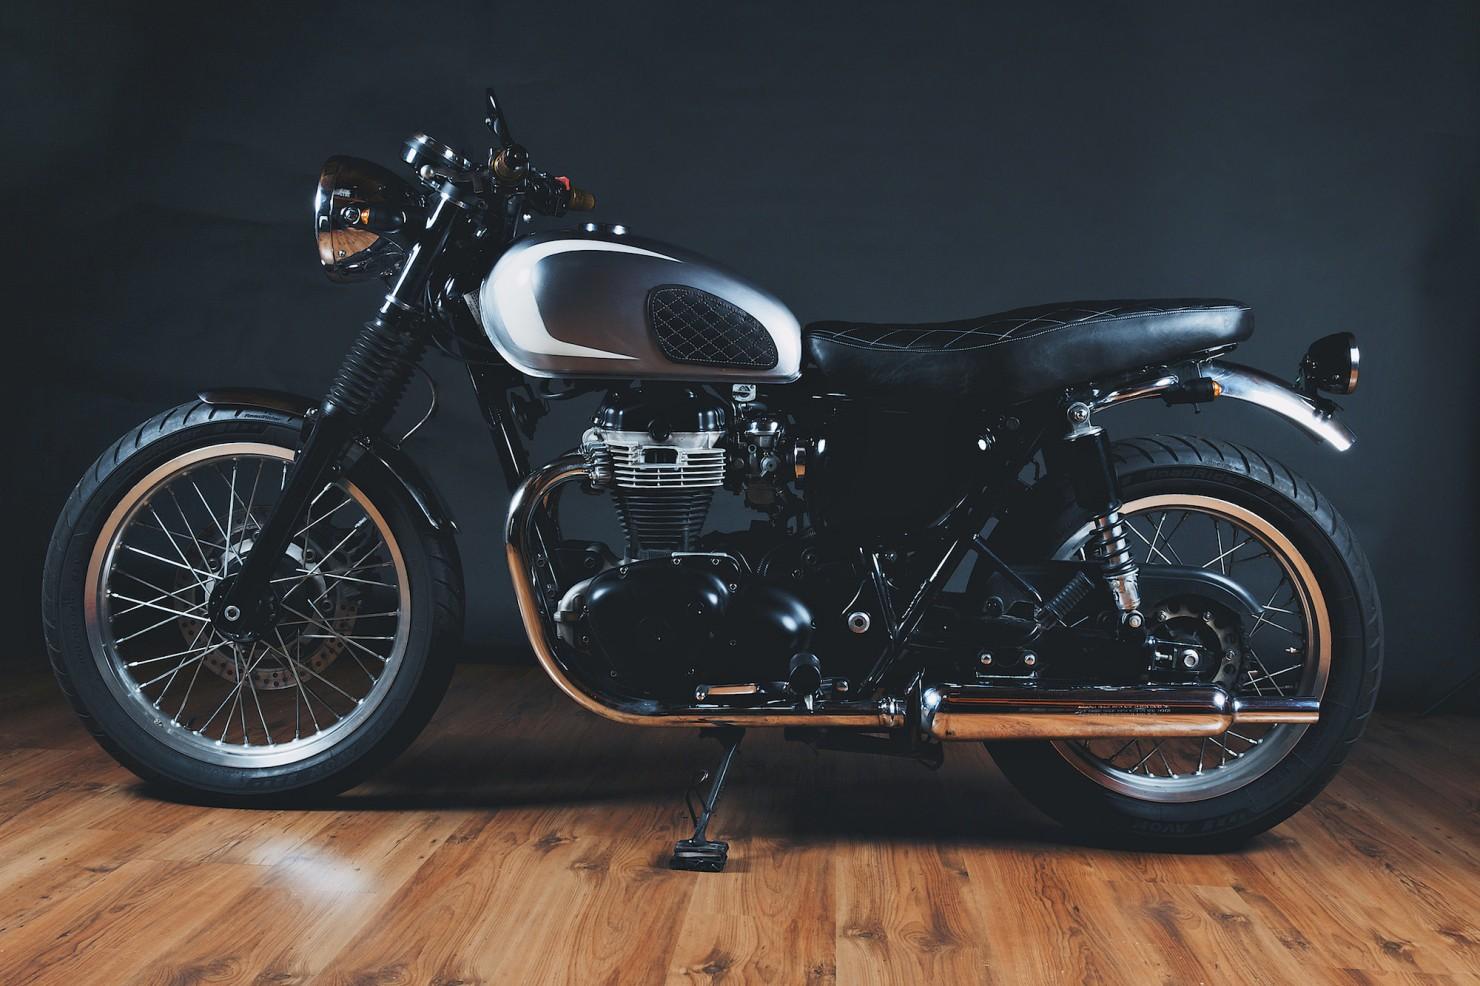 Kawasaki W650 Motorcycle 9 1480x986 Kawasaki W650